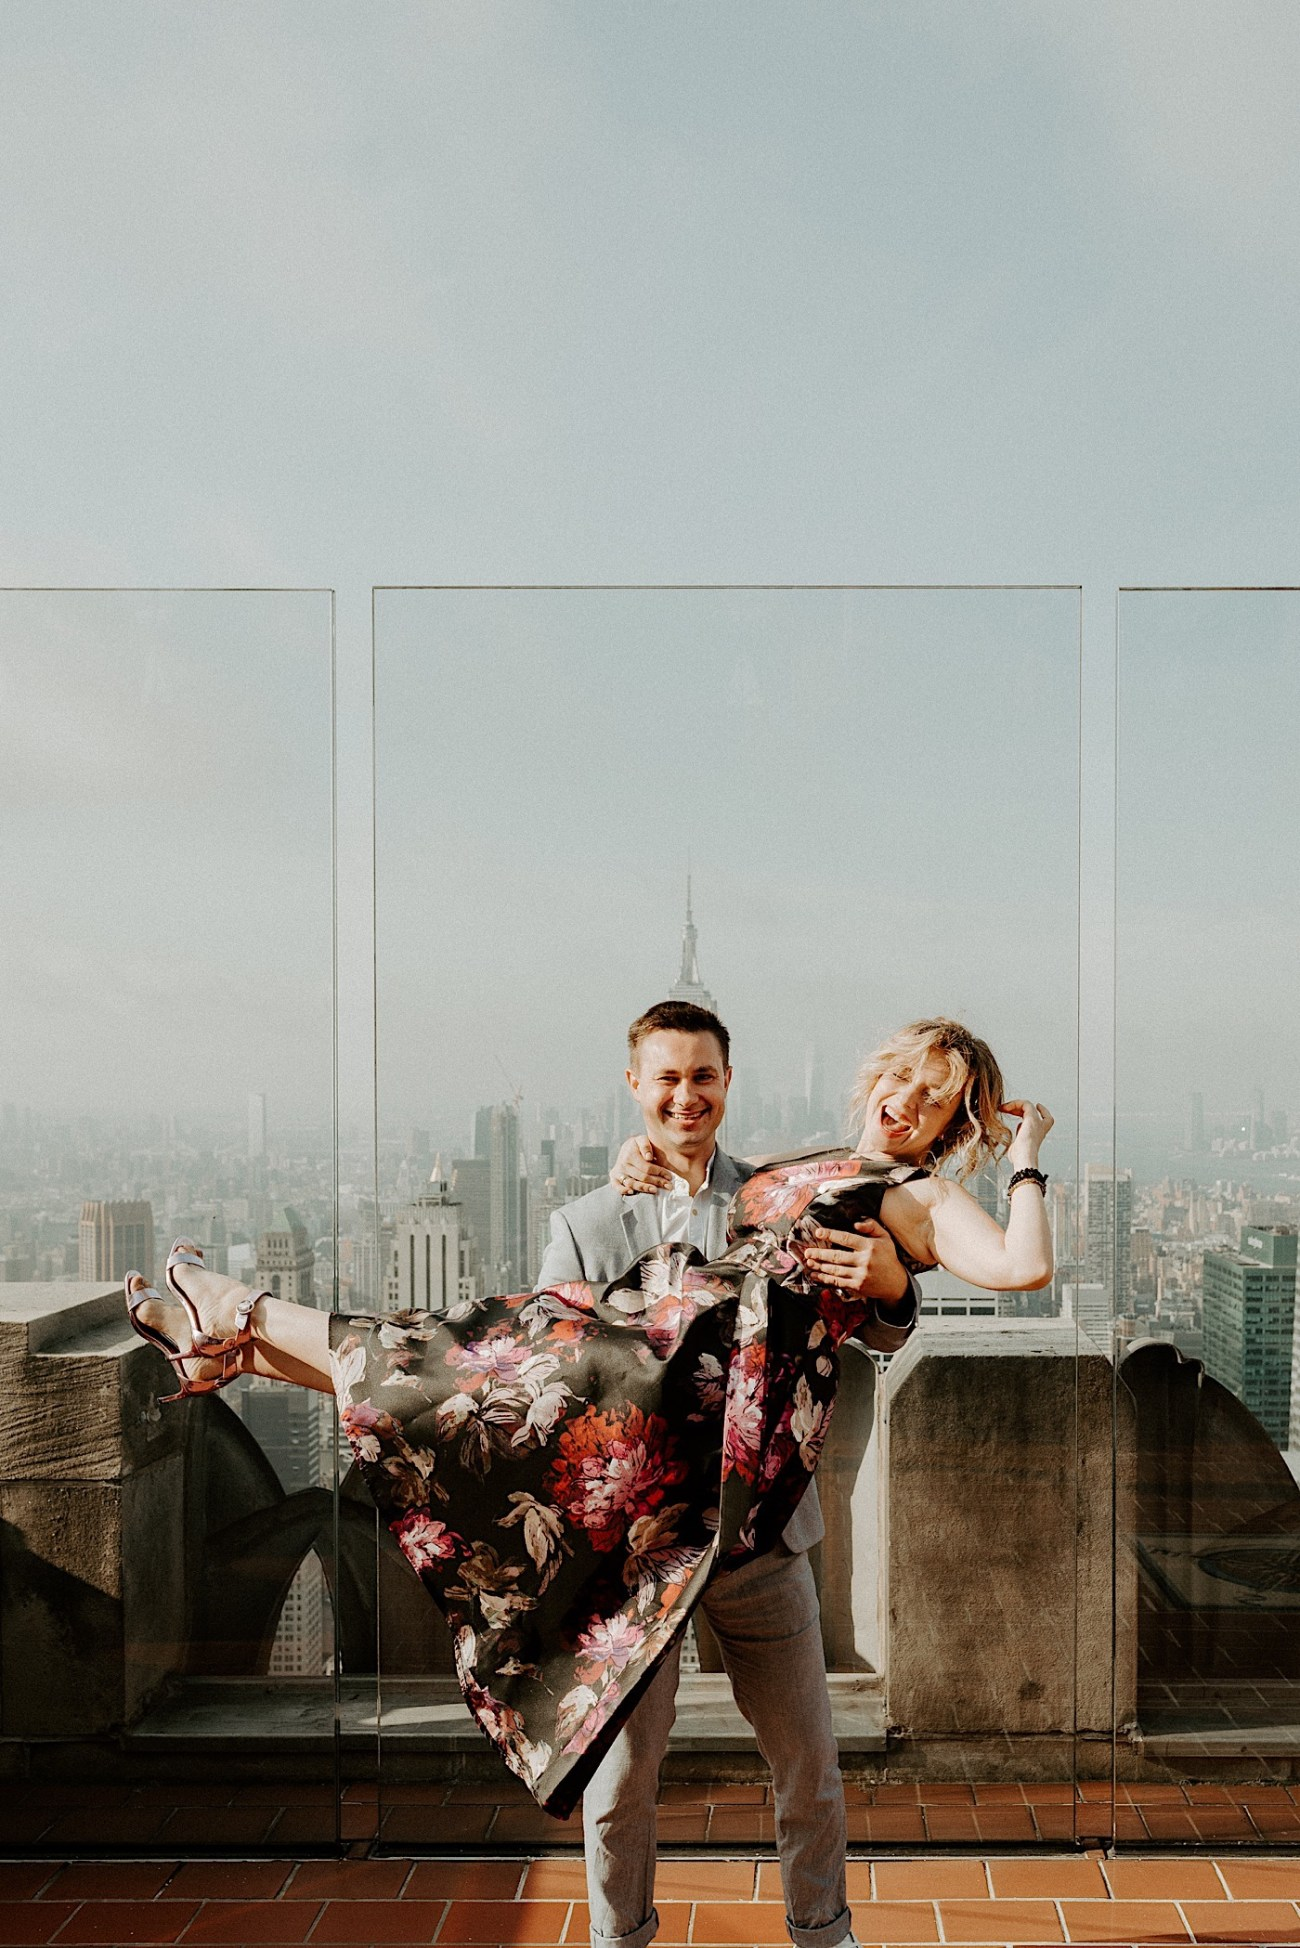 Top Of The Rock Wedding Anniversary NYC Engagement Locations New York Wedding Photographer 36